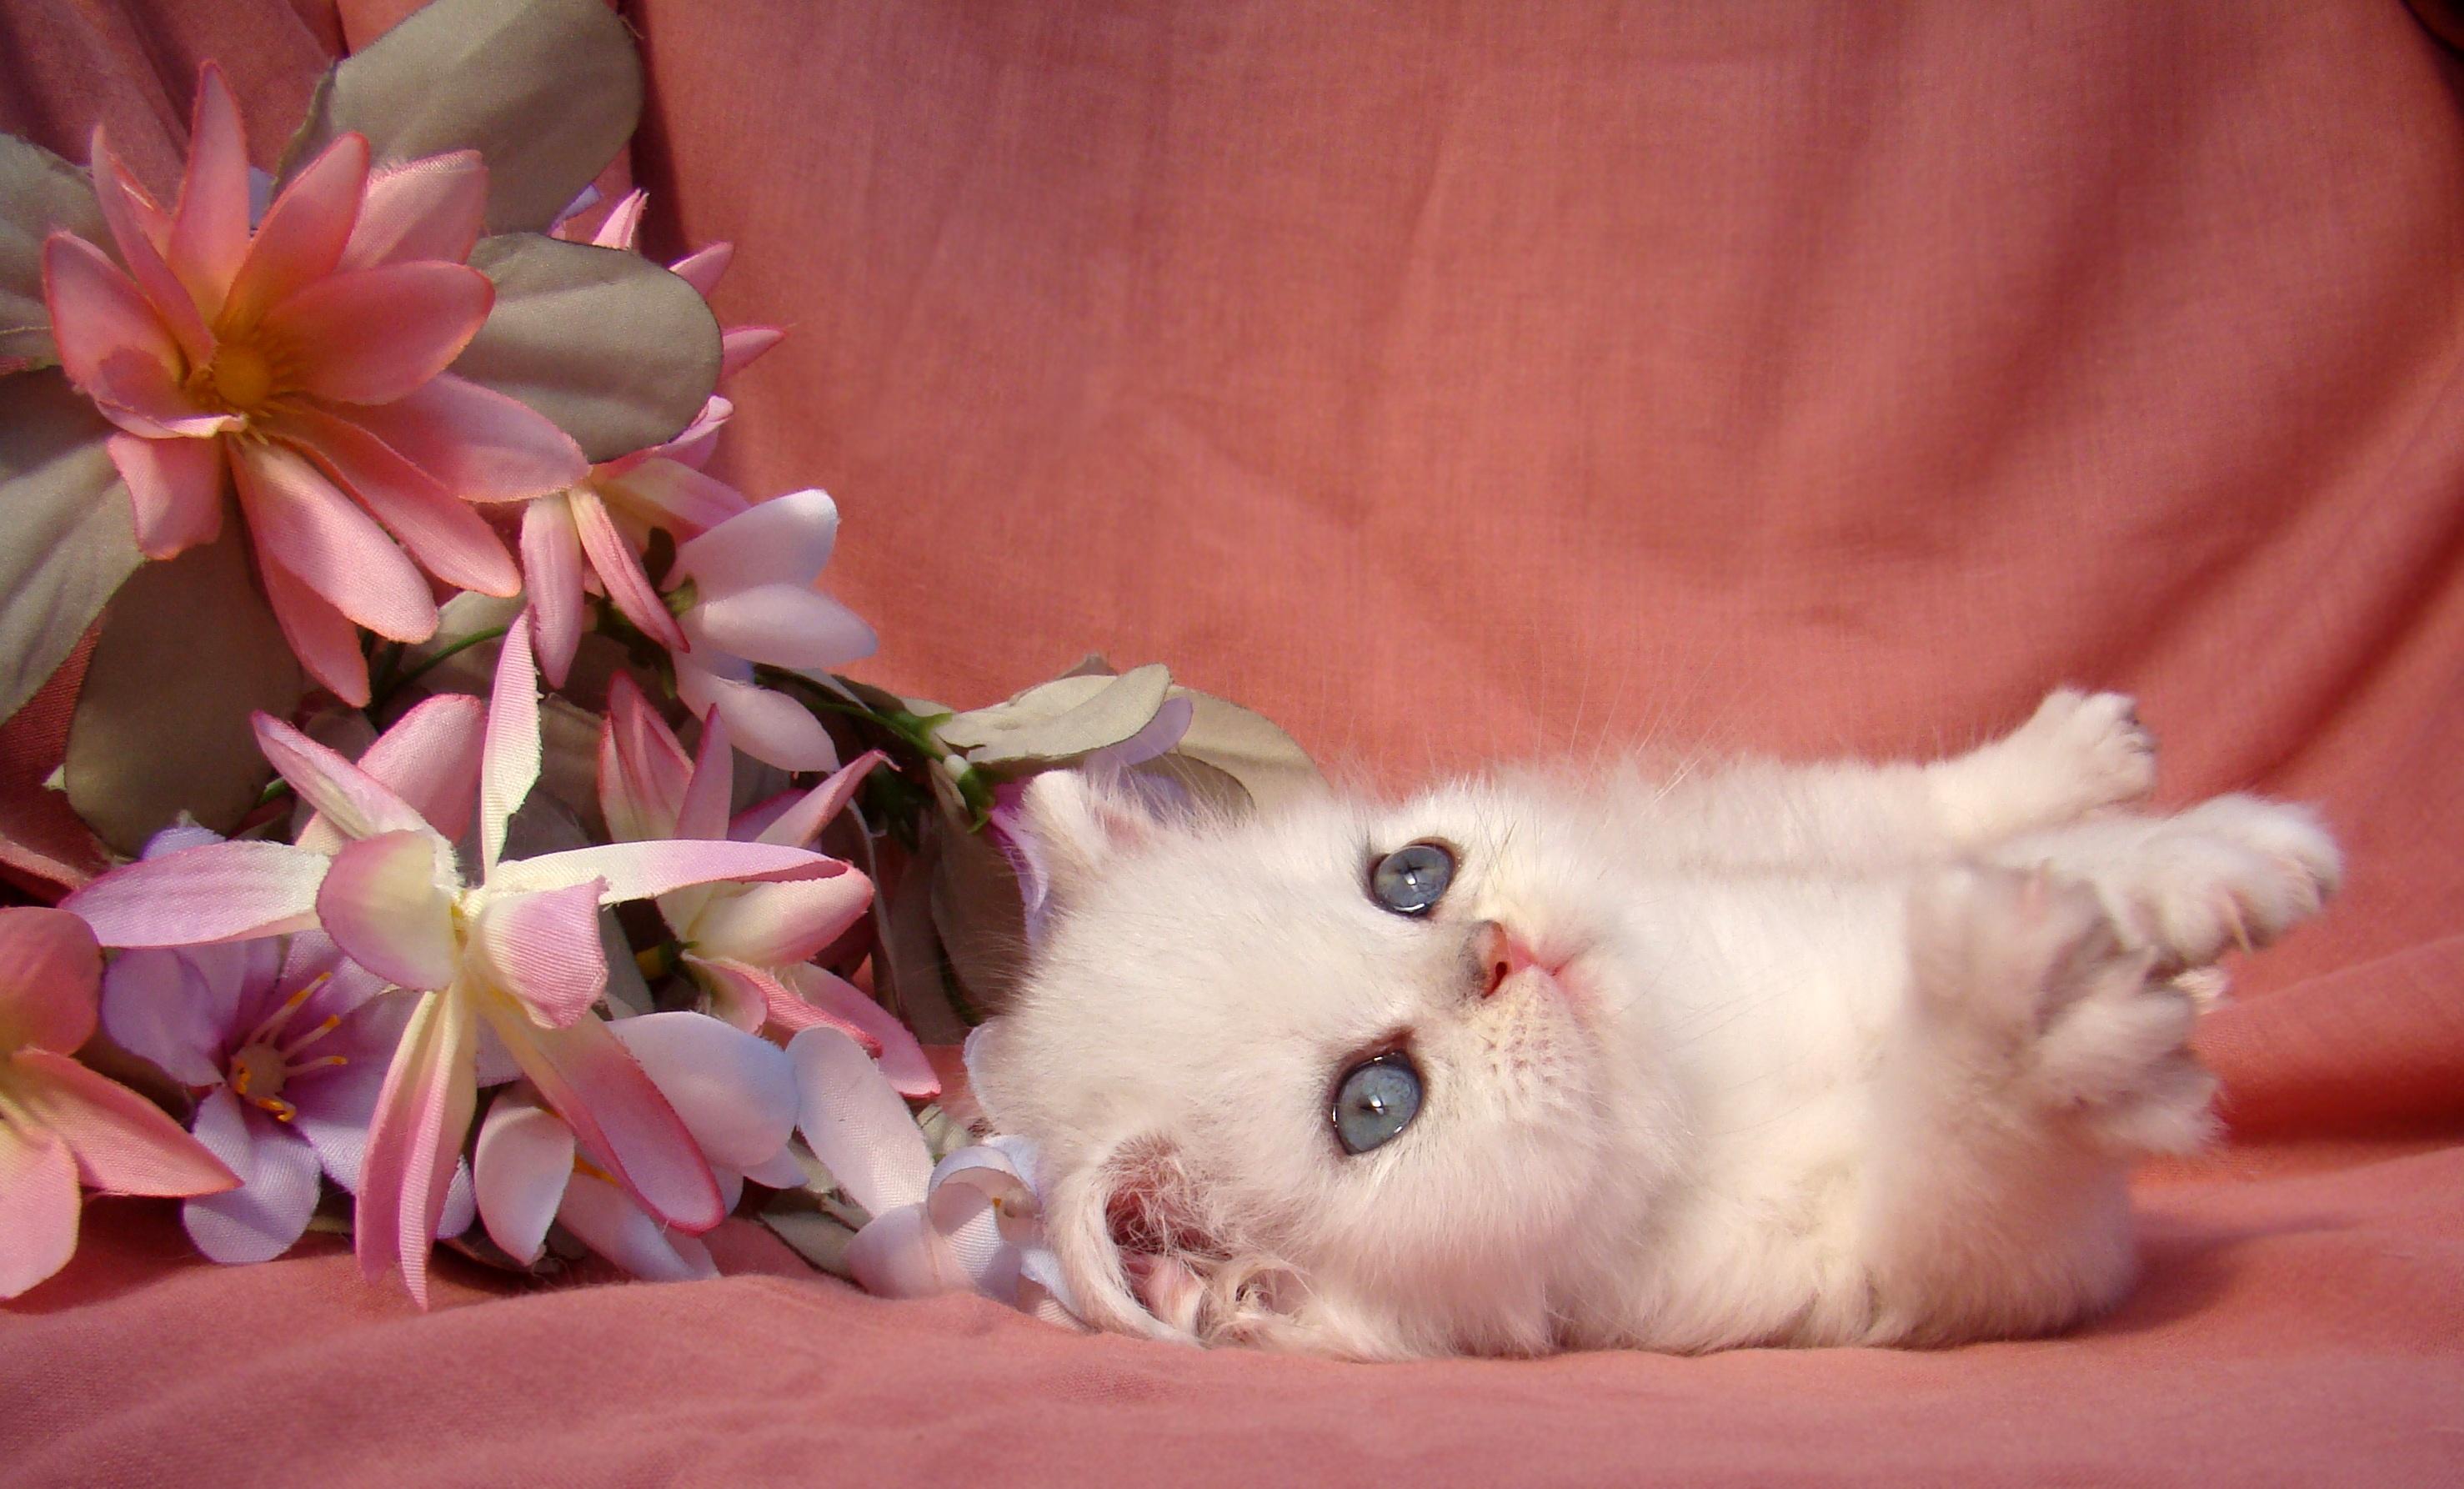 Free images flower petal puppy dog kitten pink skin flower petal puppy dog kitten cat mammal pink skin vertebrate beautiful enjoy pomeranian mys small to mightylinksfo